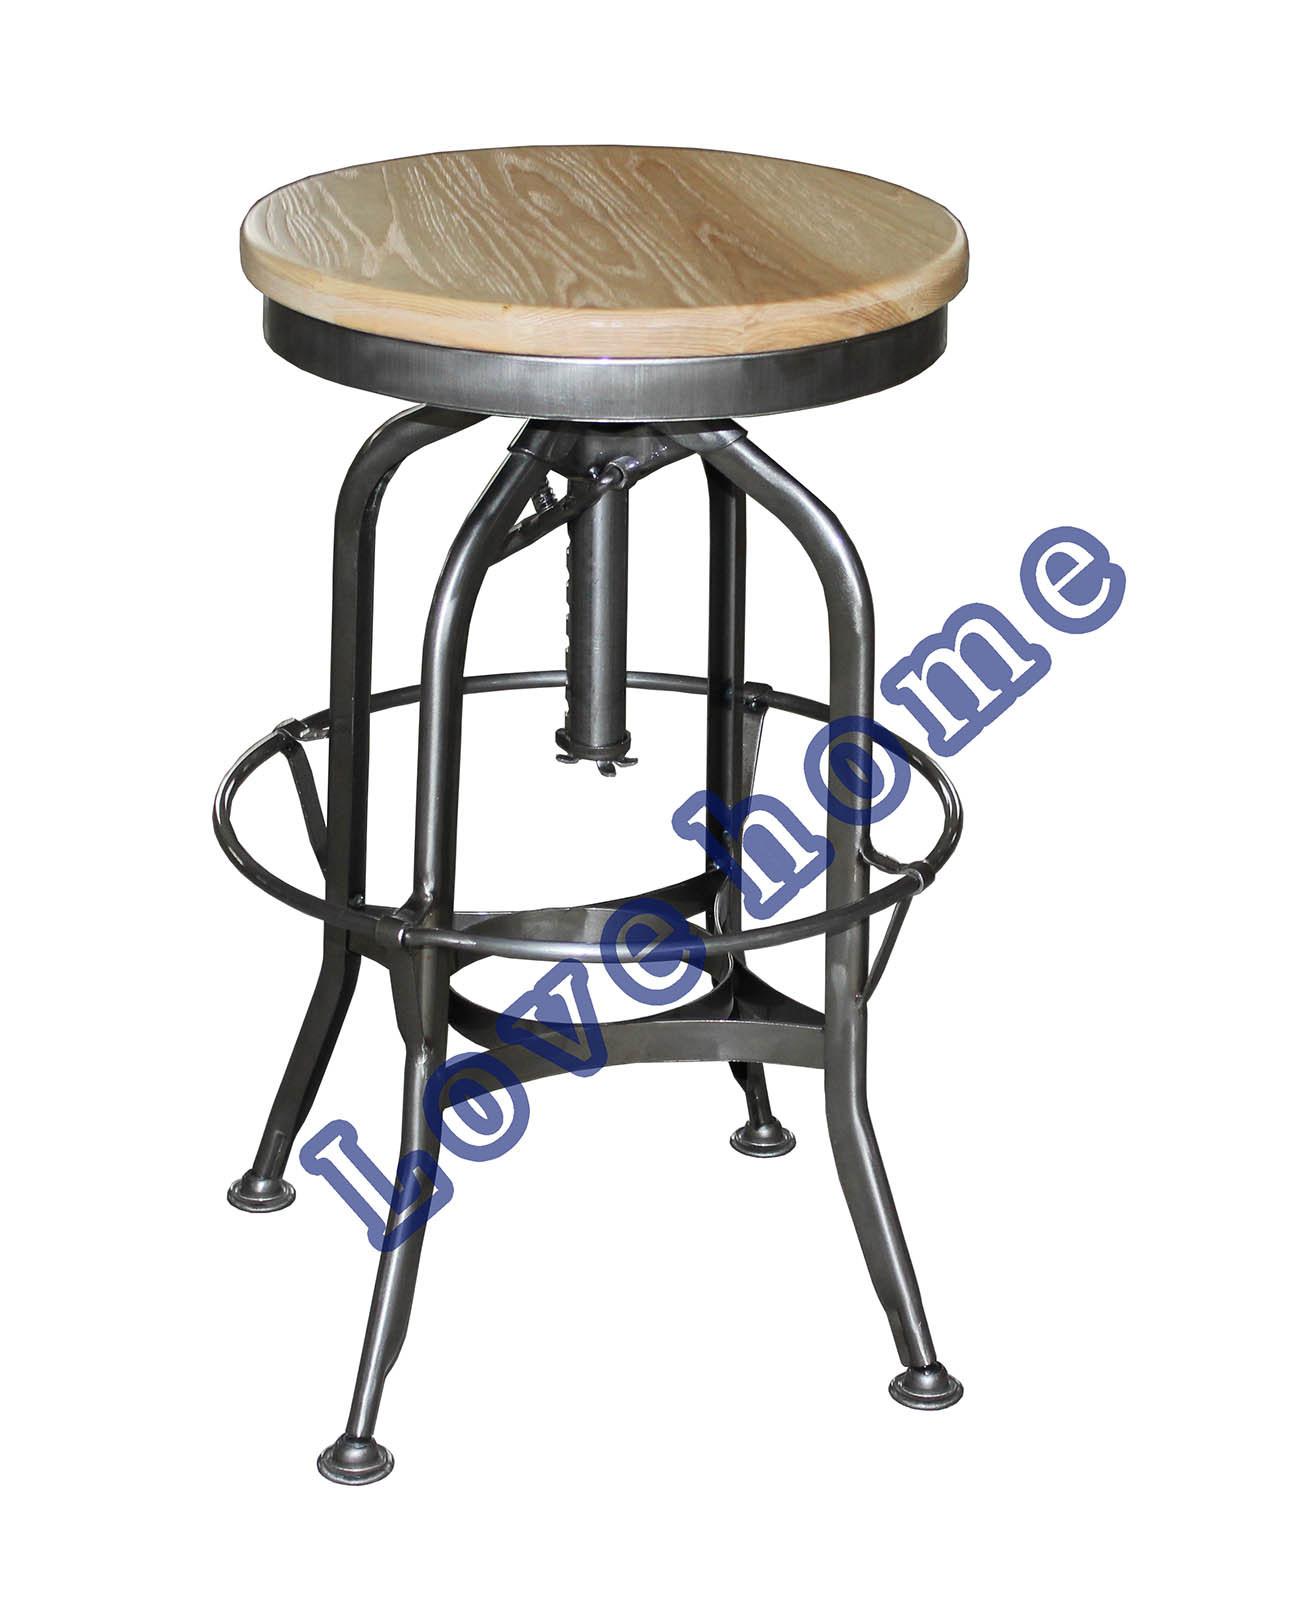 China Modern Replica Industrial Metal Restaurant Dining Furniture Steel H62 Turner Vintage